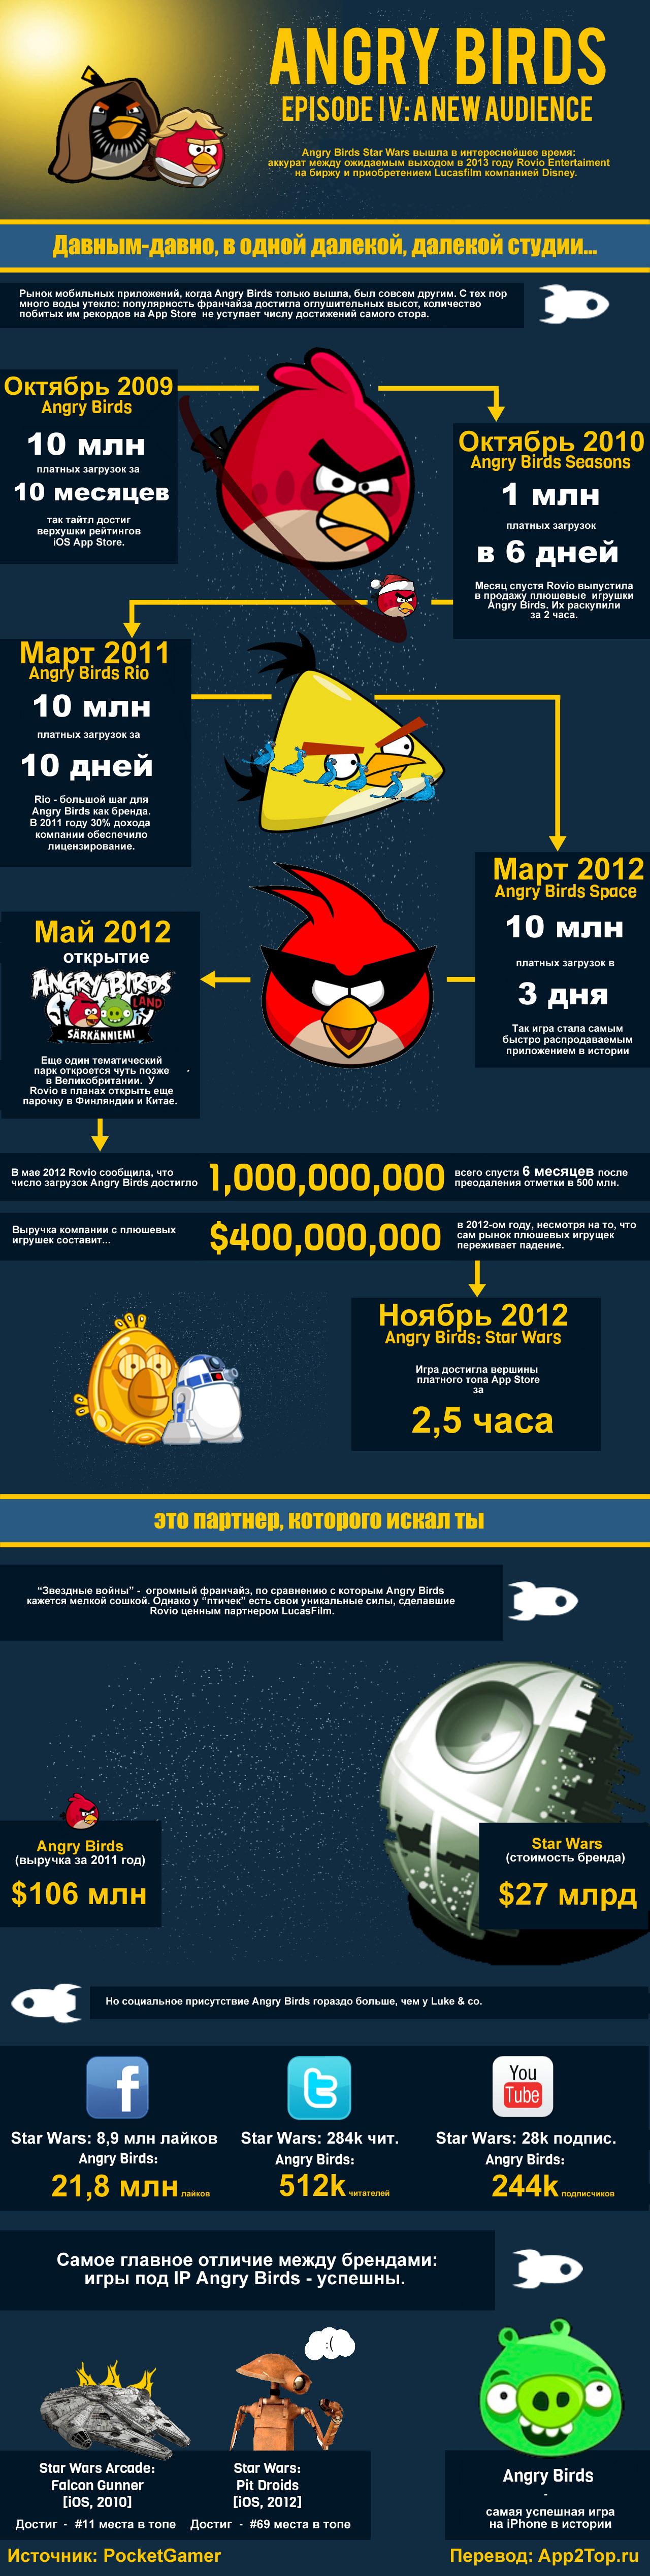 Angry-Birds: история успеха